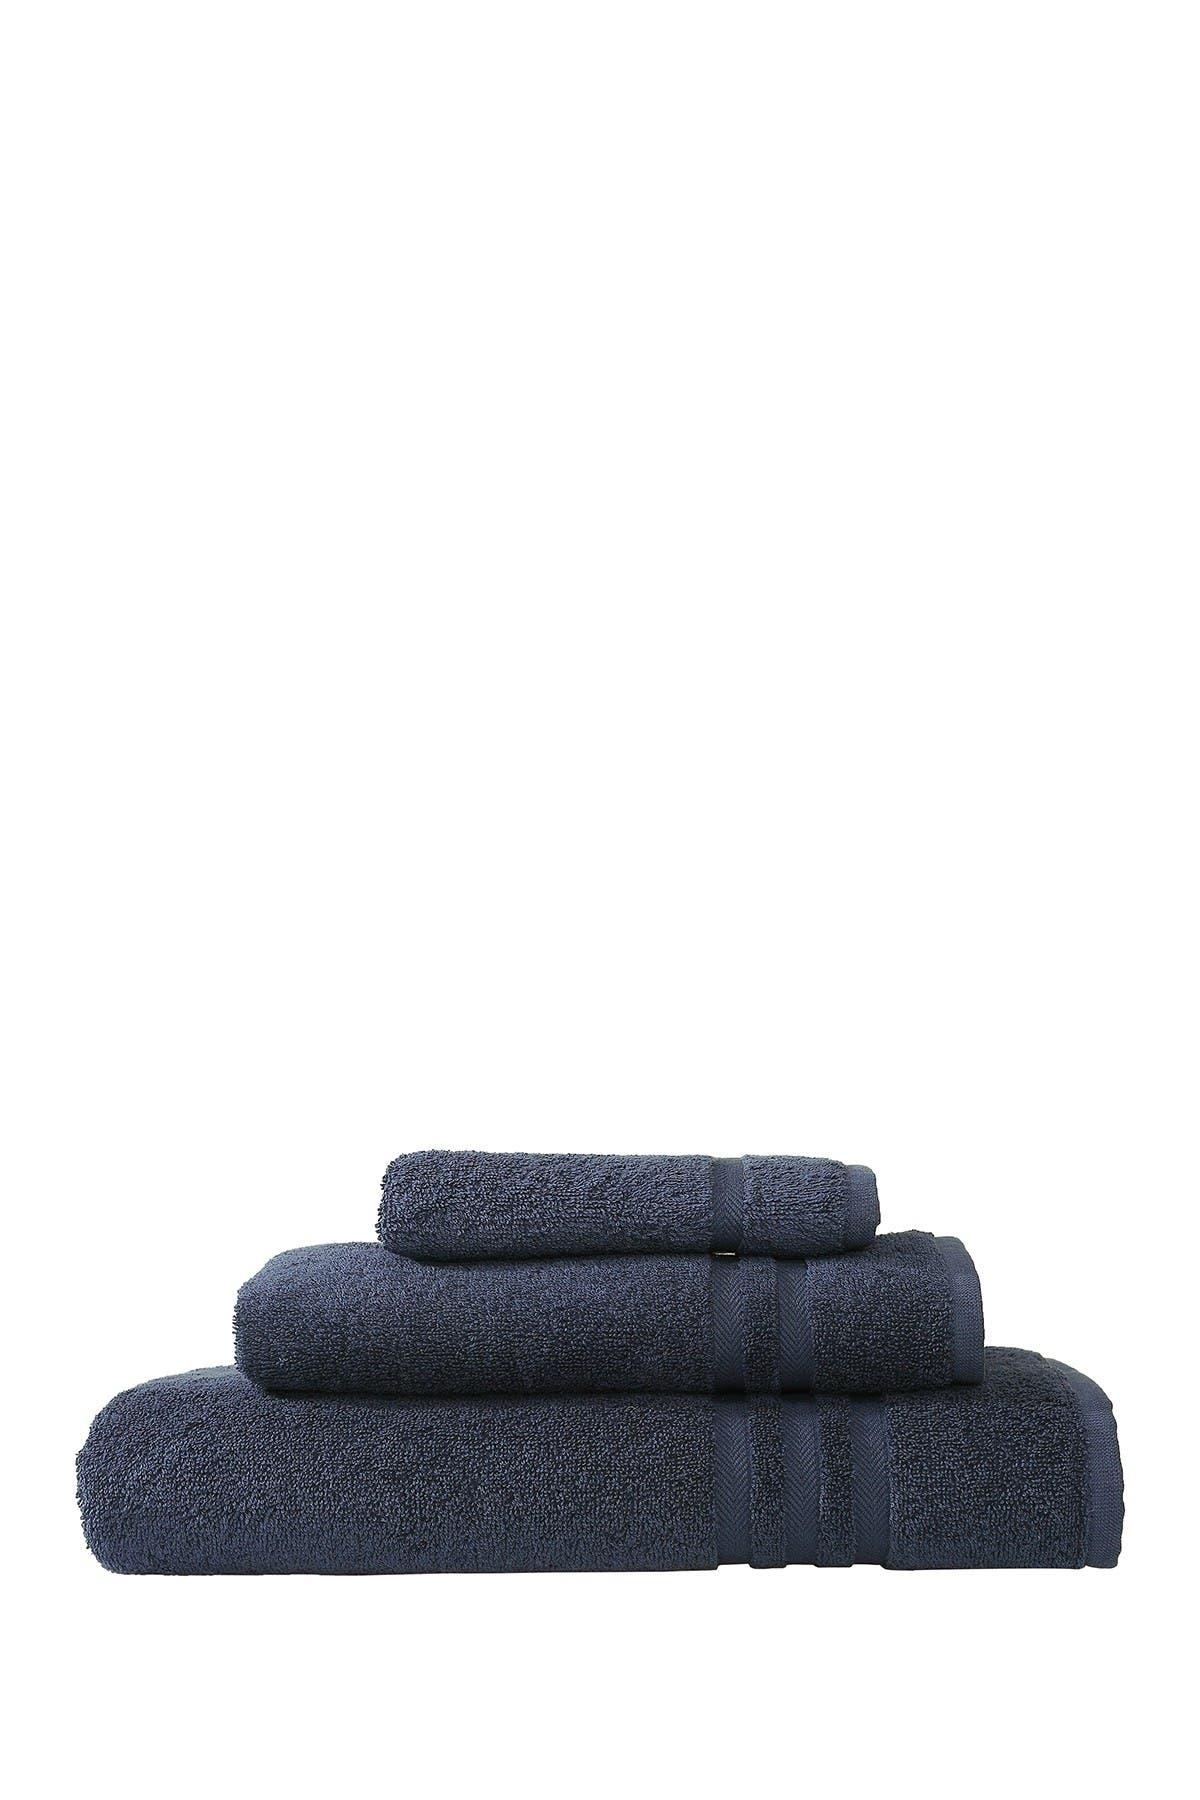 Image of LINUM TOWELS Denzi 3-Piece Towel Set - Twilight Blue